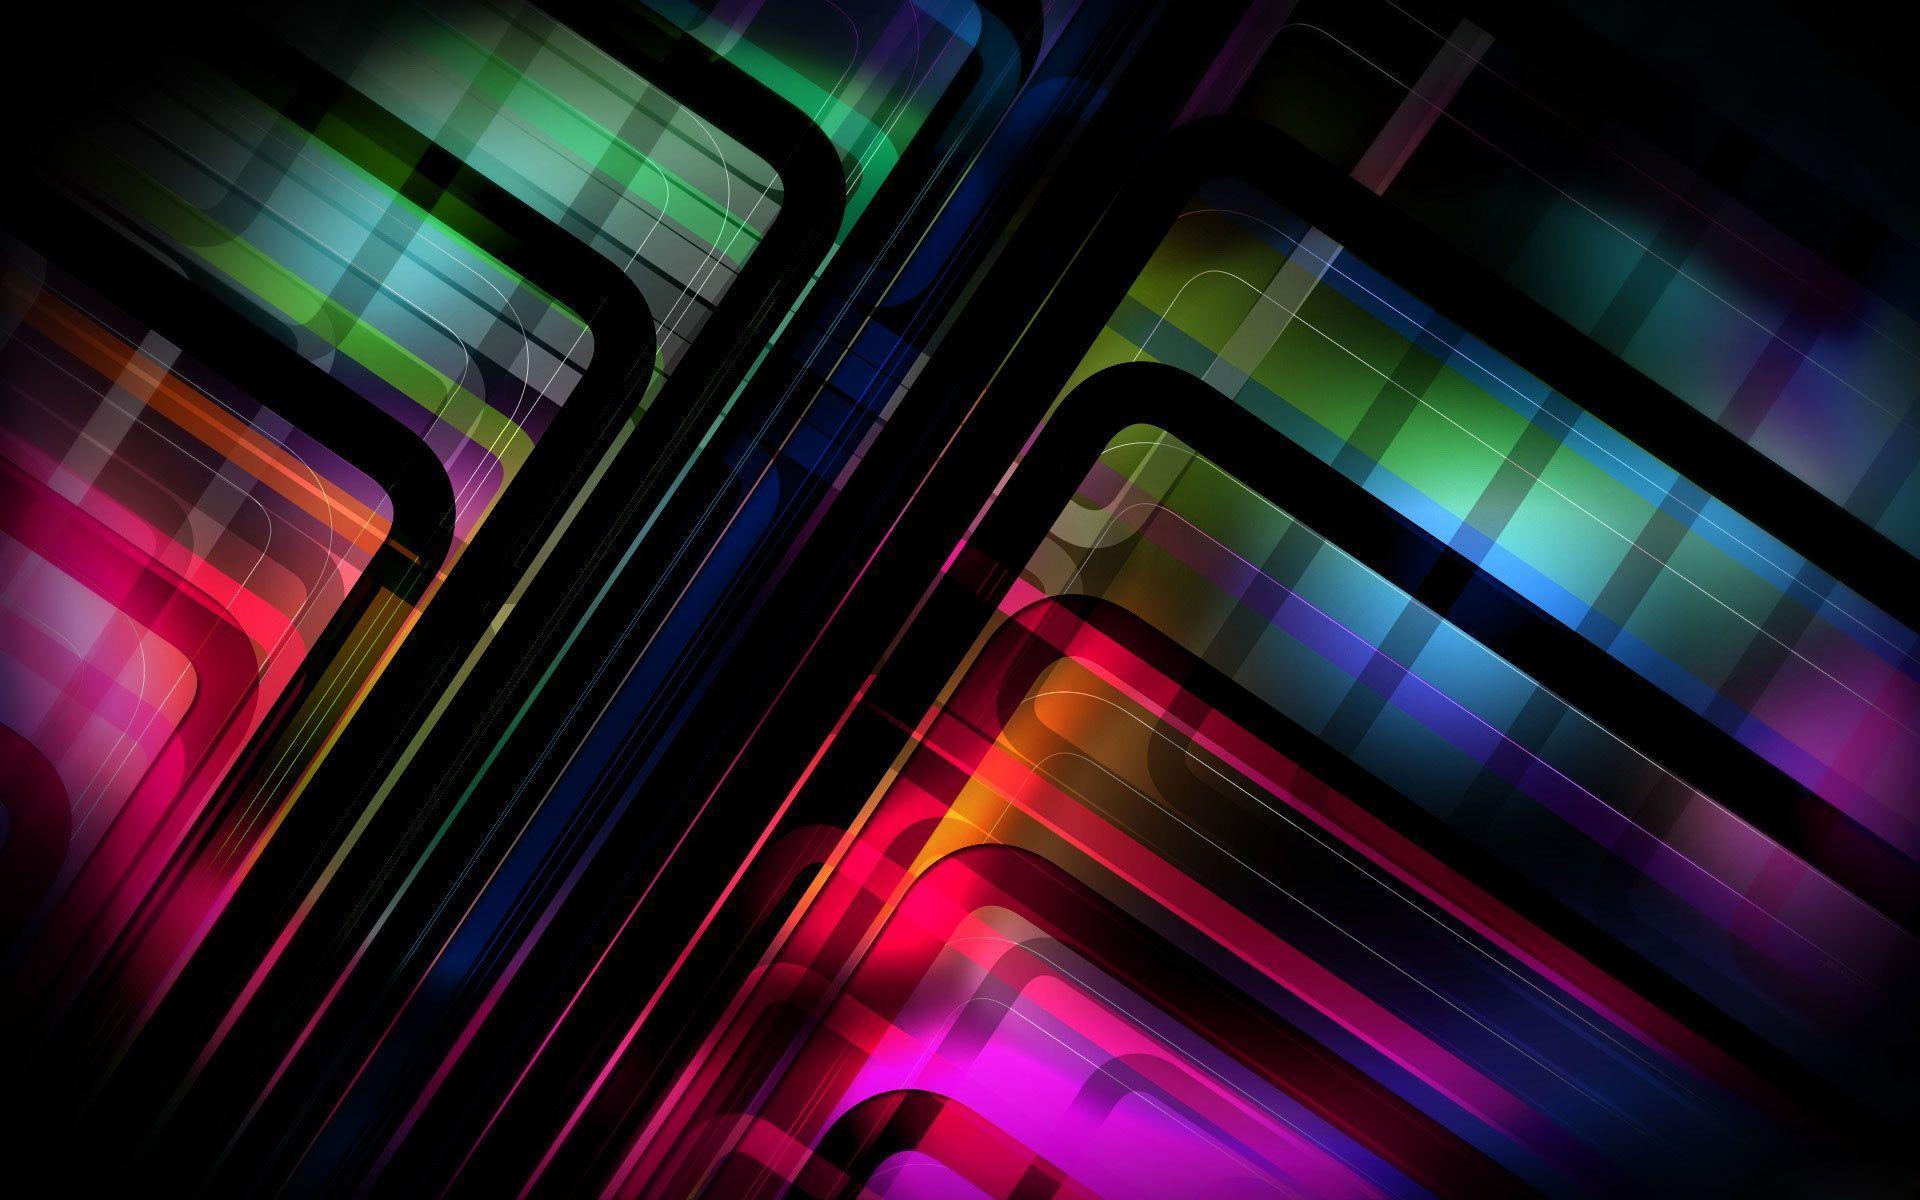 Cool Backgrounds For Computer Desktops - Wallpaper Cave